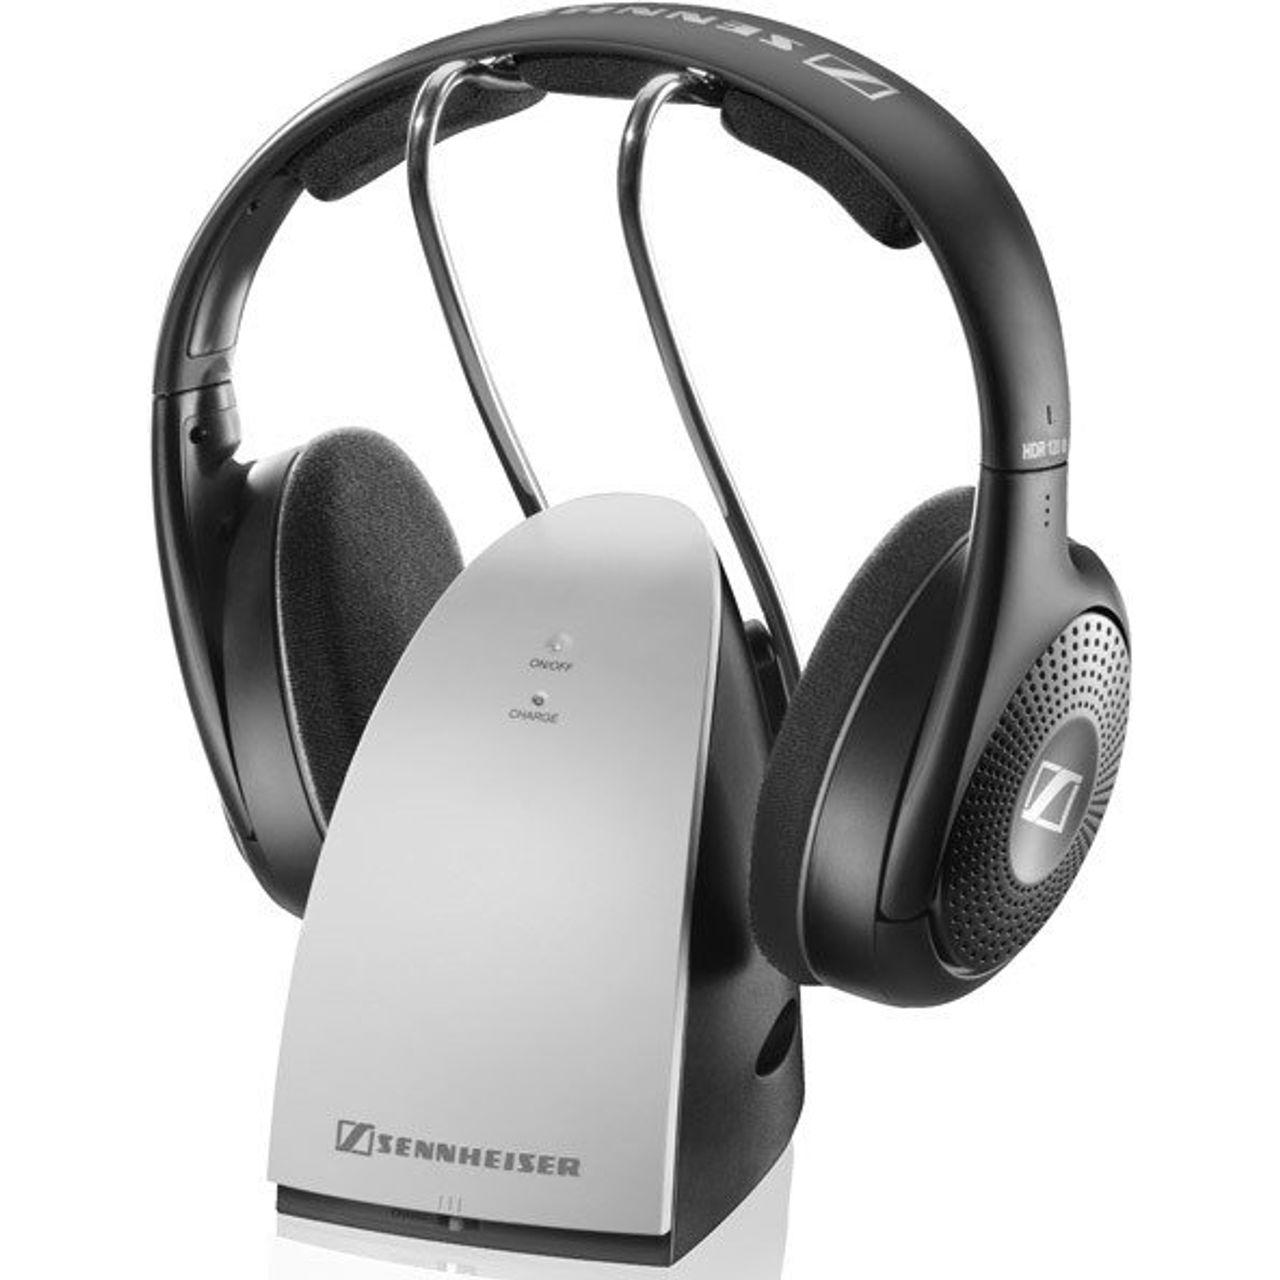 Sennheiser RS 120II Head-band Headphones - Black